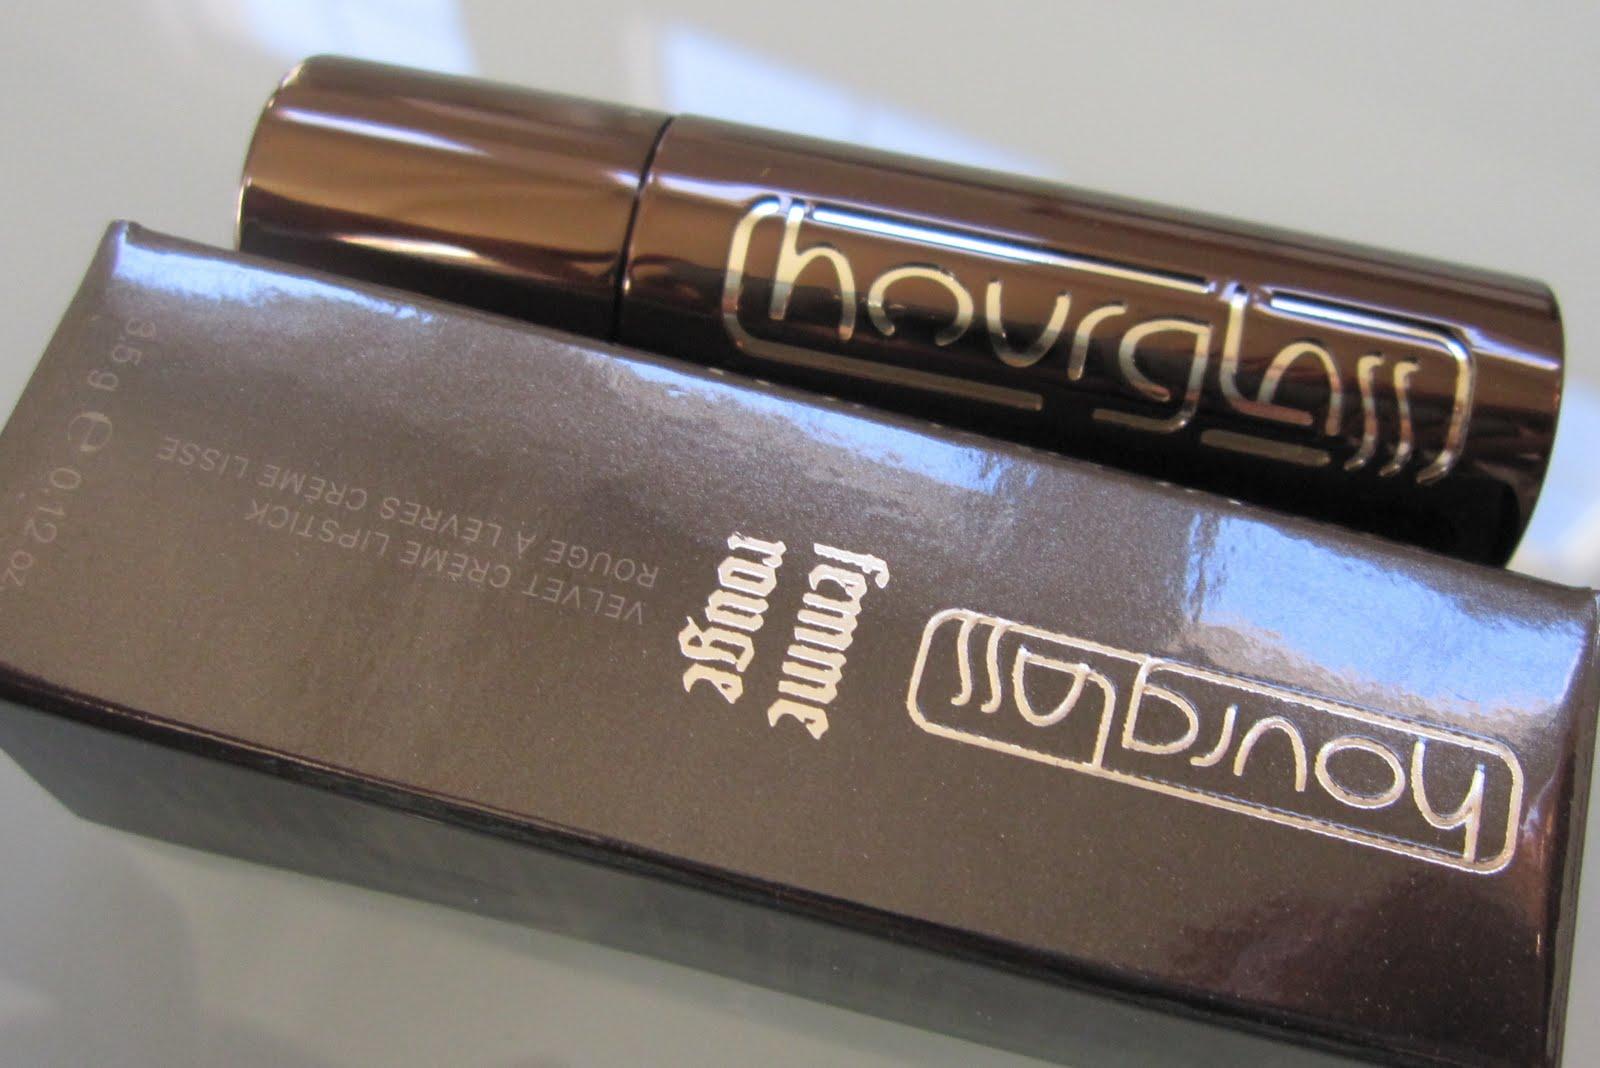 Hourglass Cosmetics Katrina Hess Makeup Studio